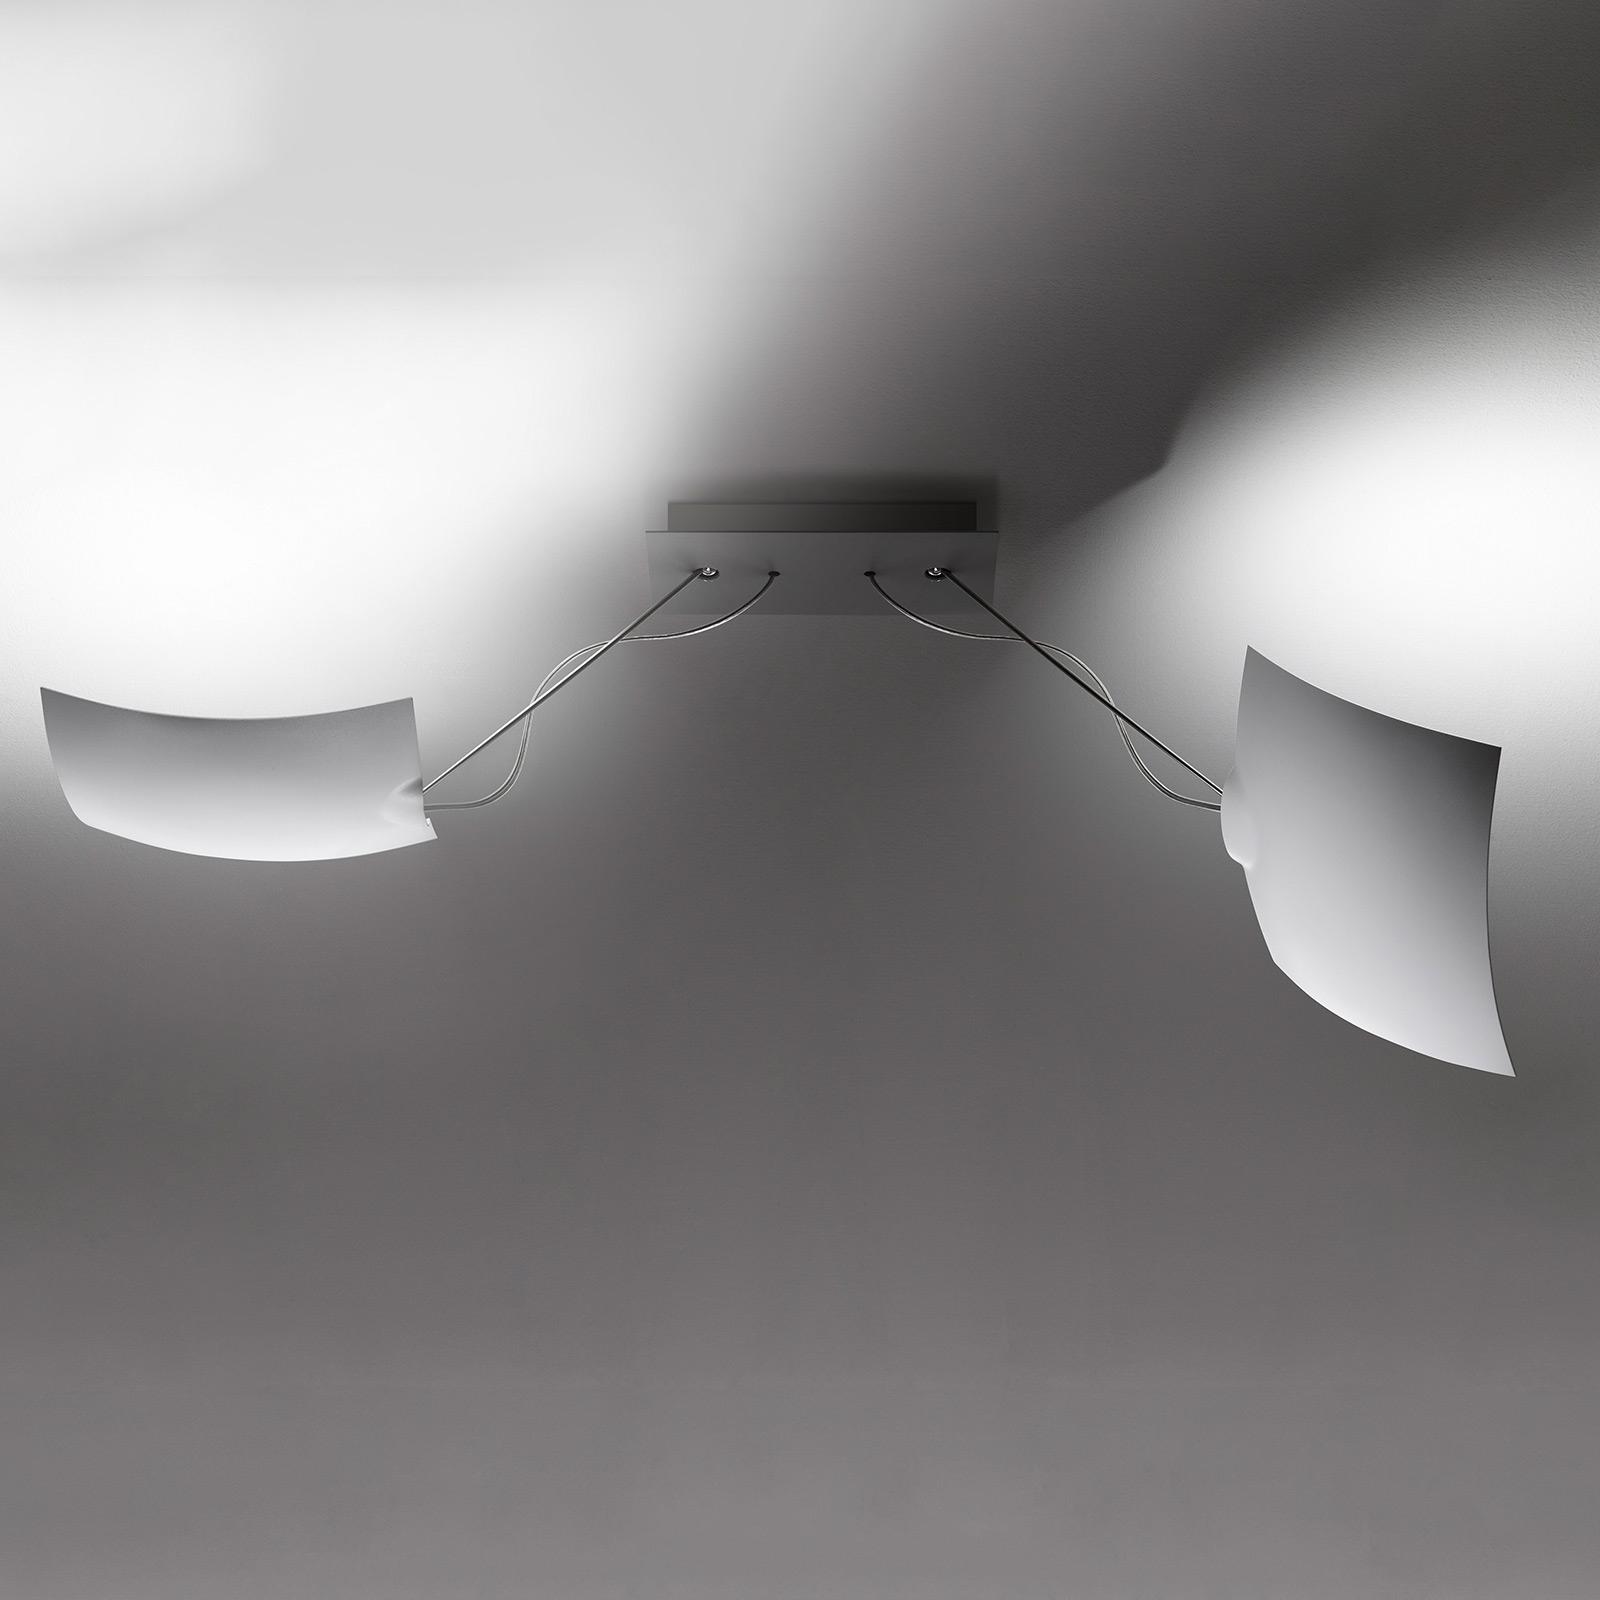 Ingo Maurer 2x18x18 lampa sufitowa LED, 2-punktowa